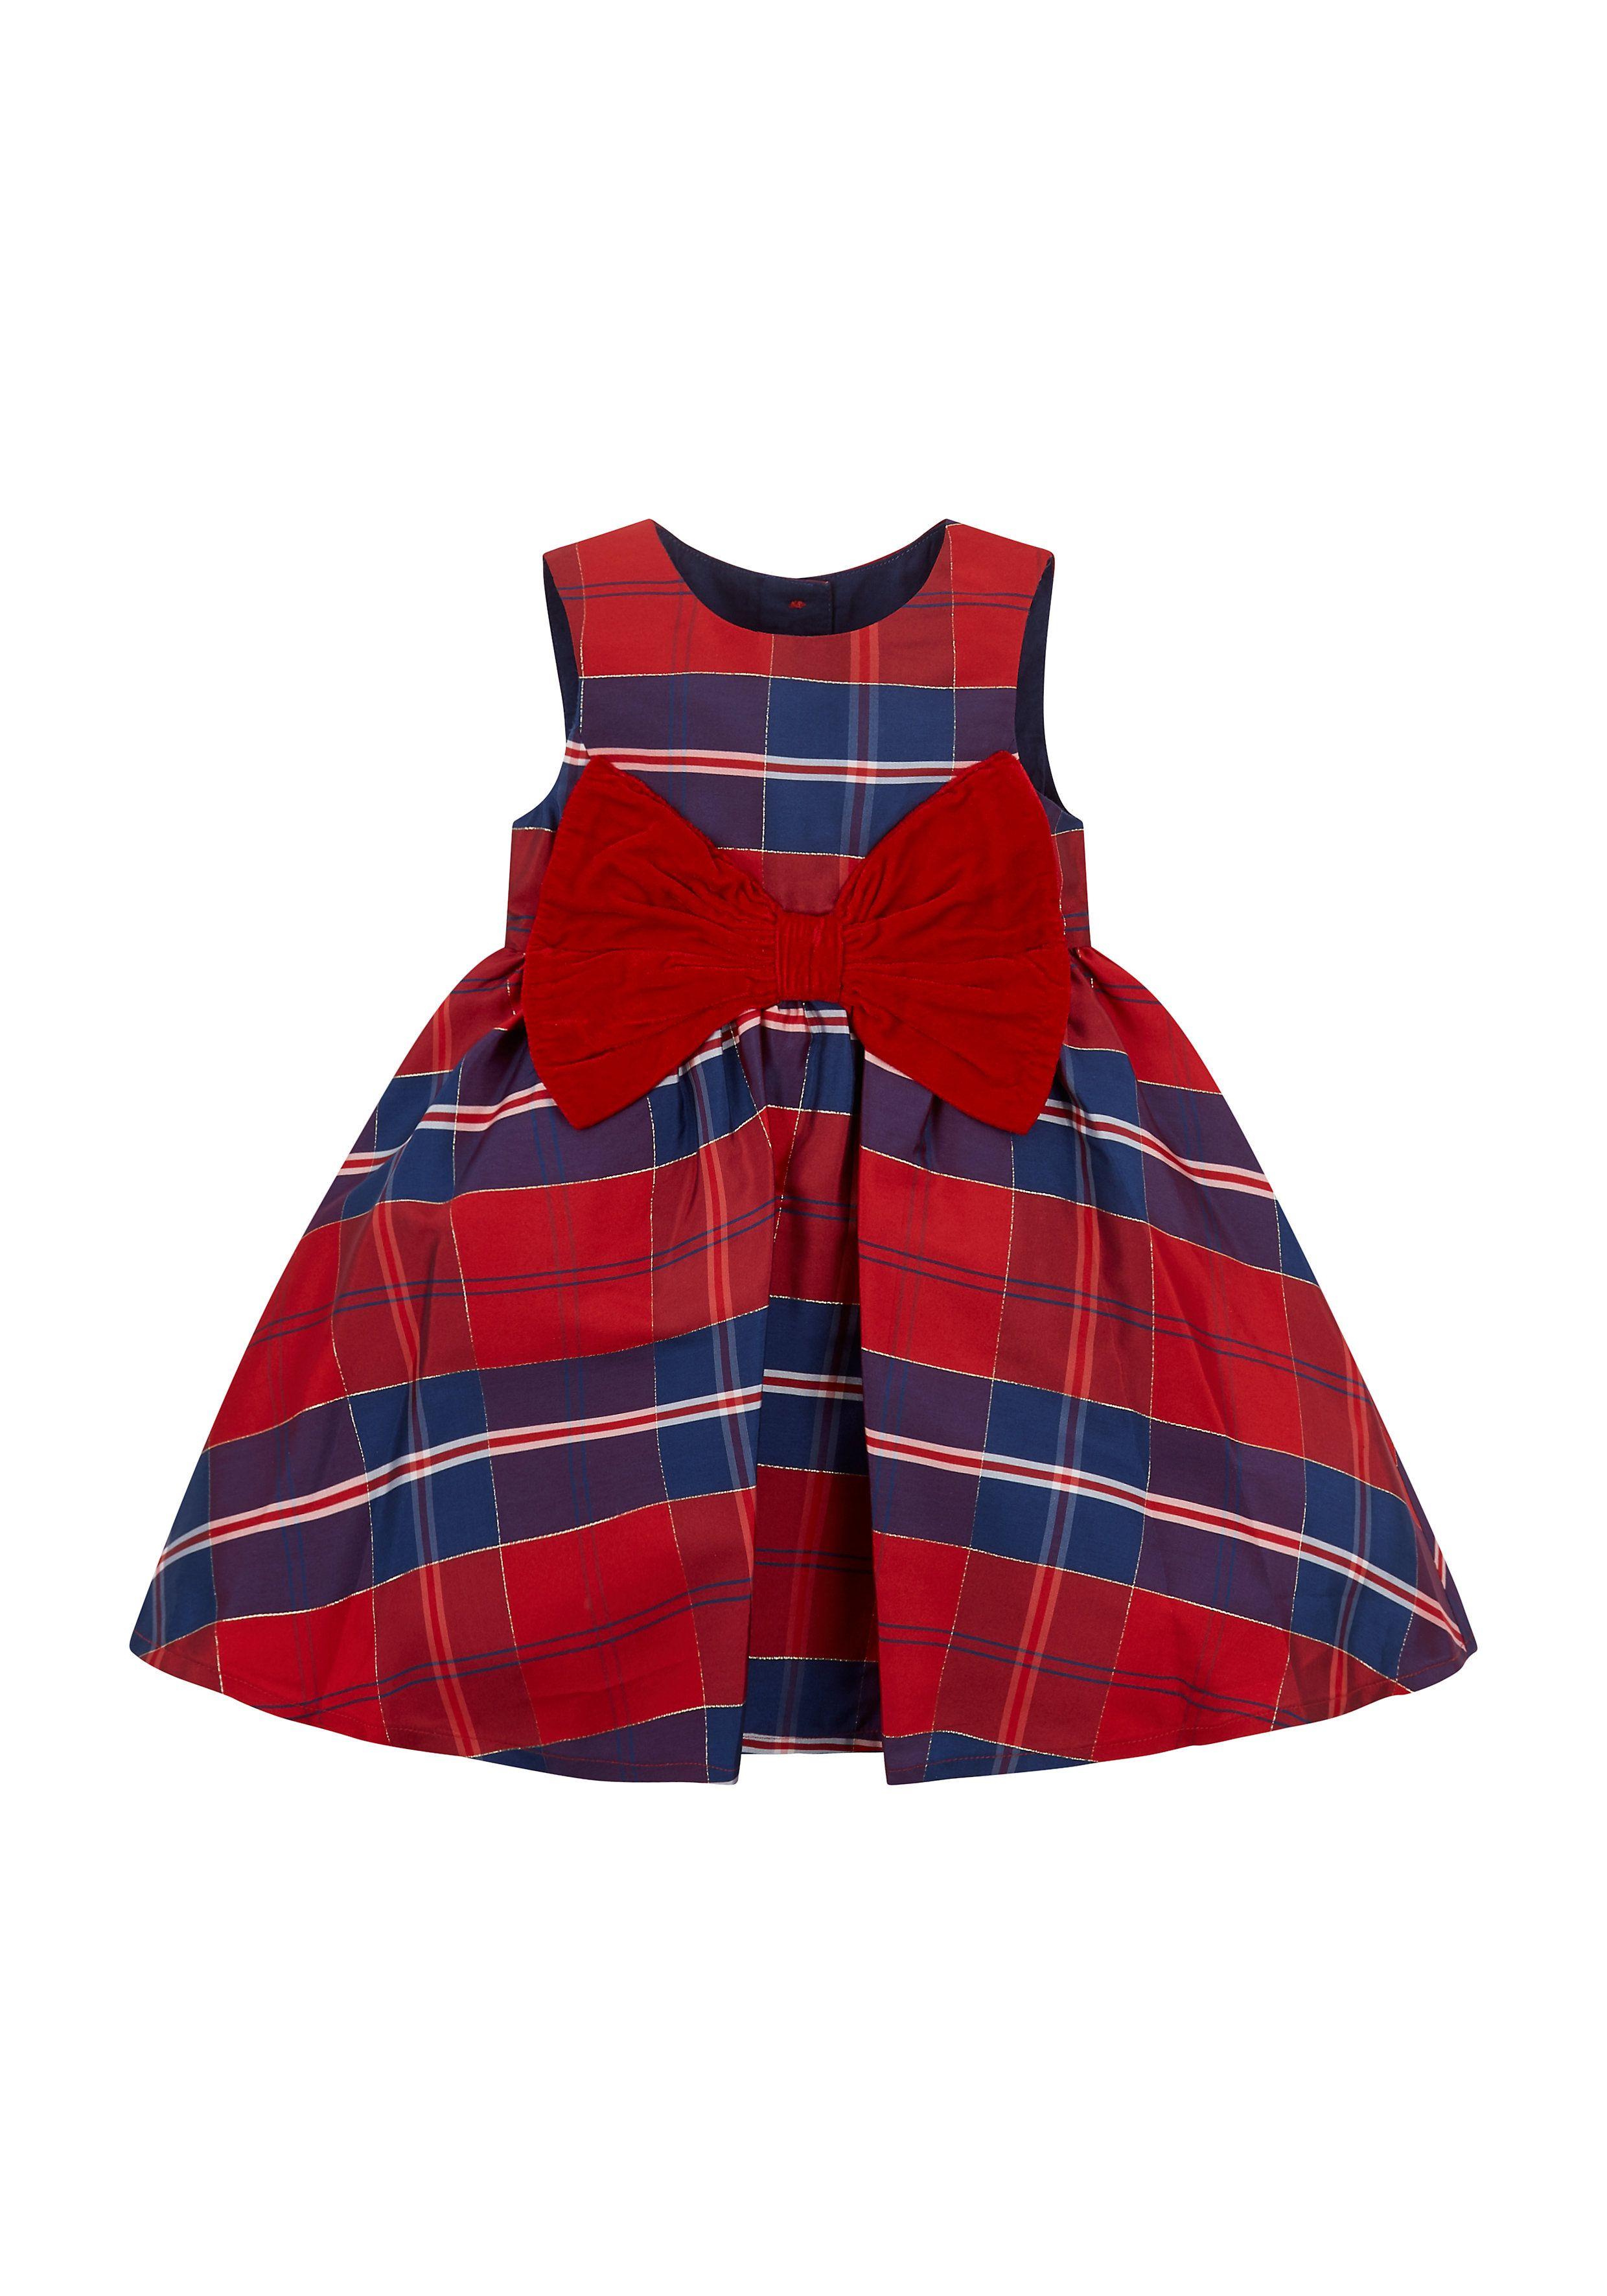 Mothercare | Girls Tartan Party Dress - Red